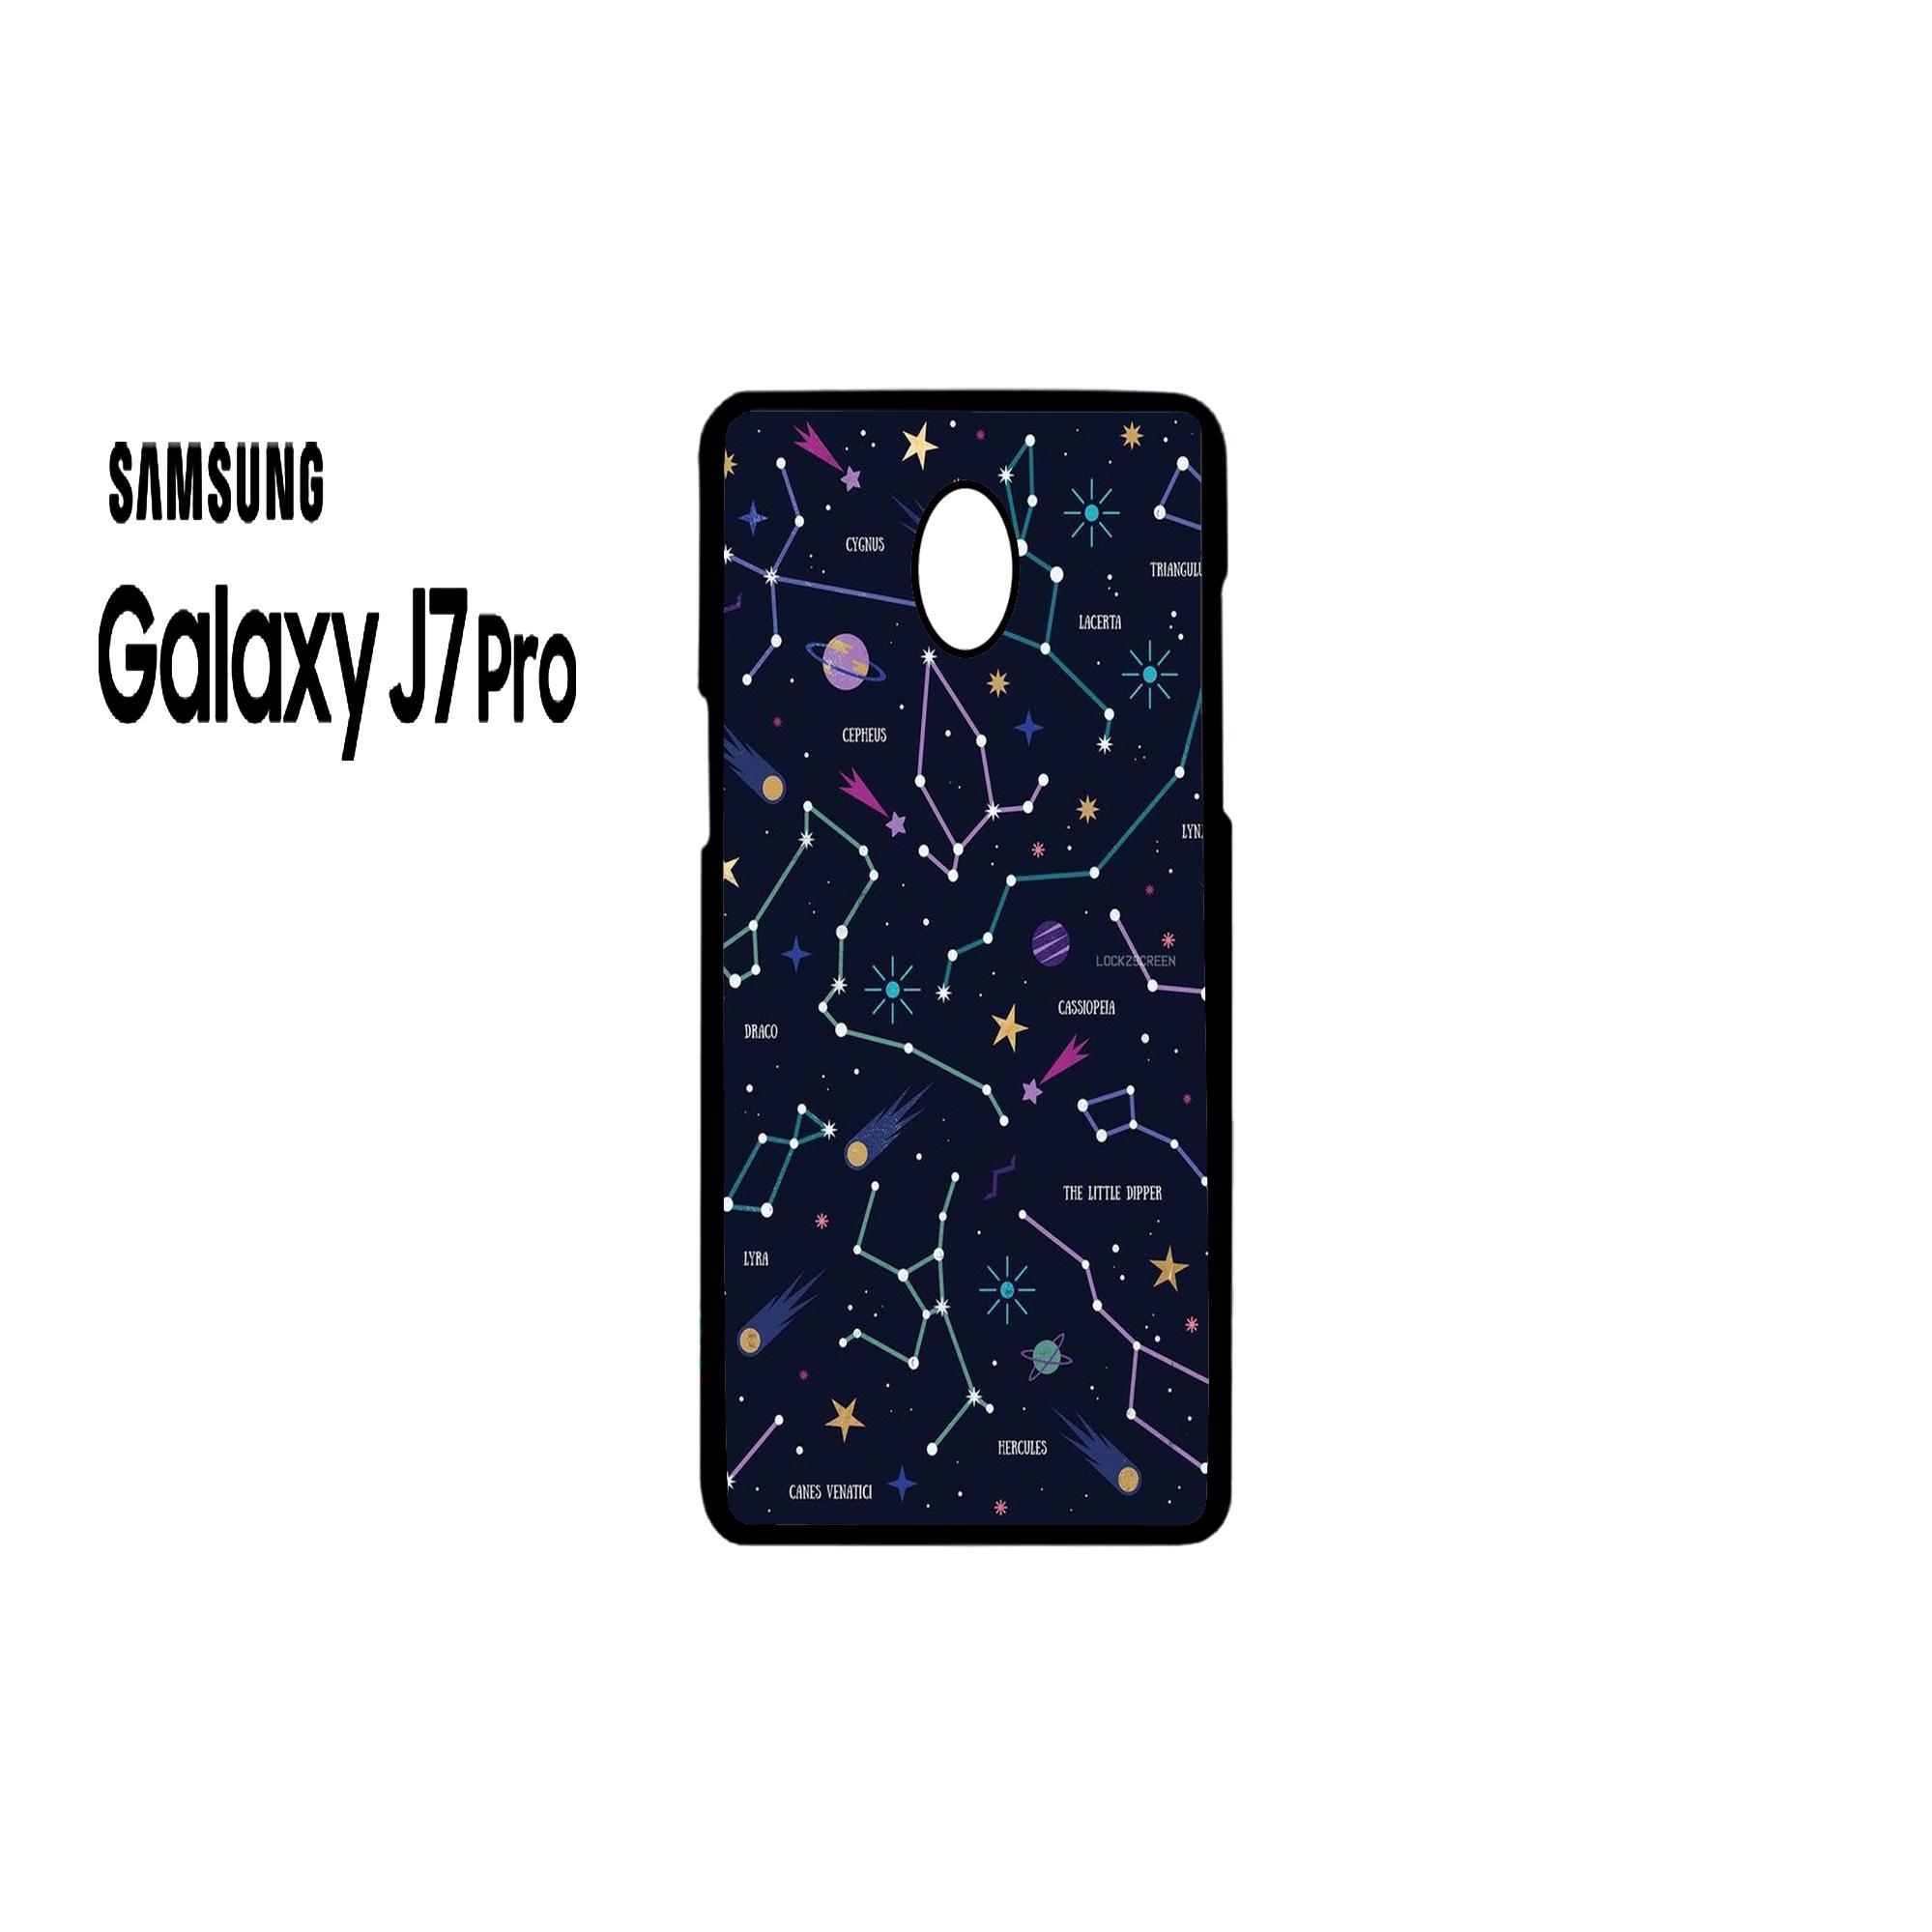 Rajamurah fasion printing case Samsung Galaxy J7pro - 5